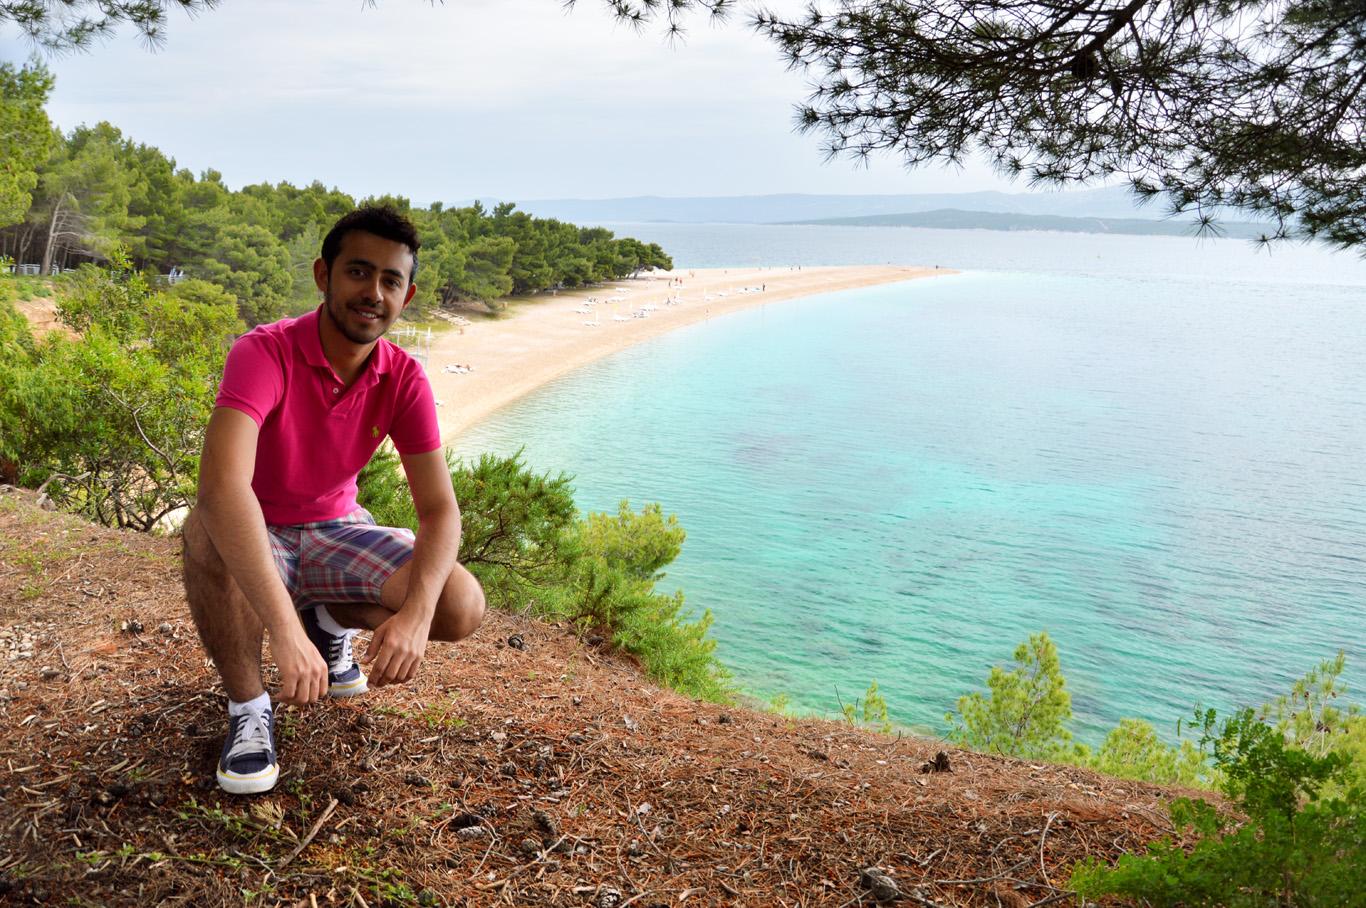 At Zlatni Rat beach